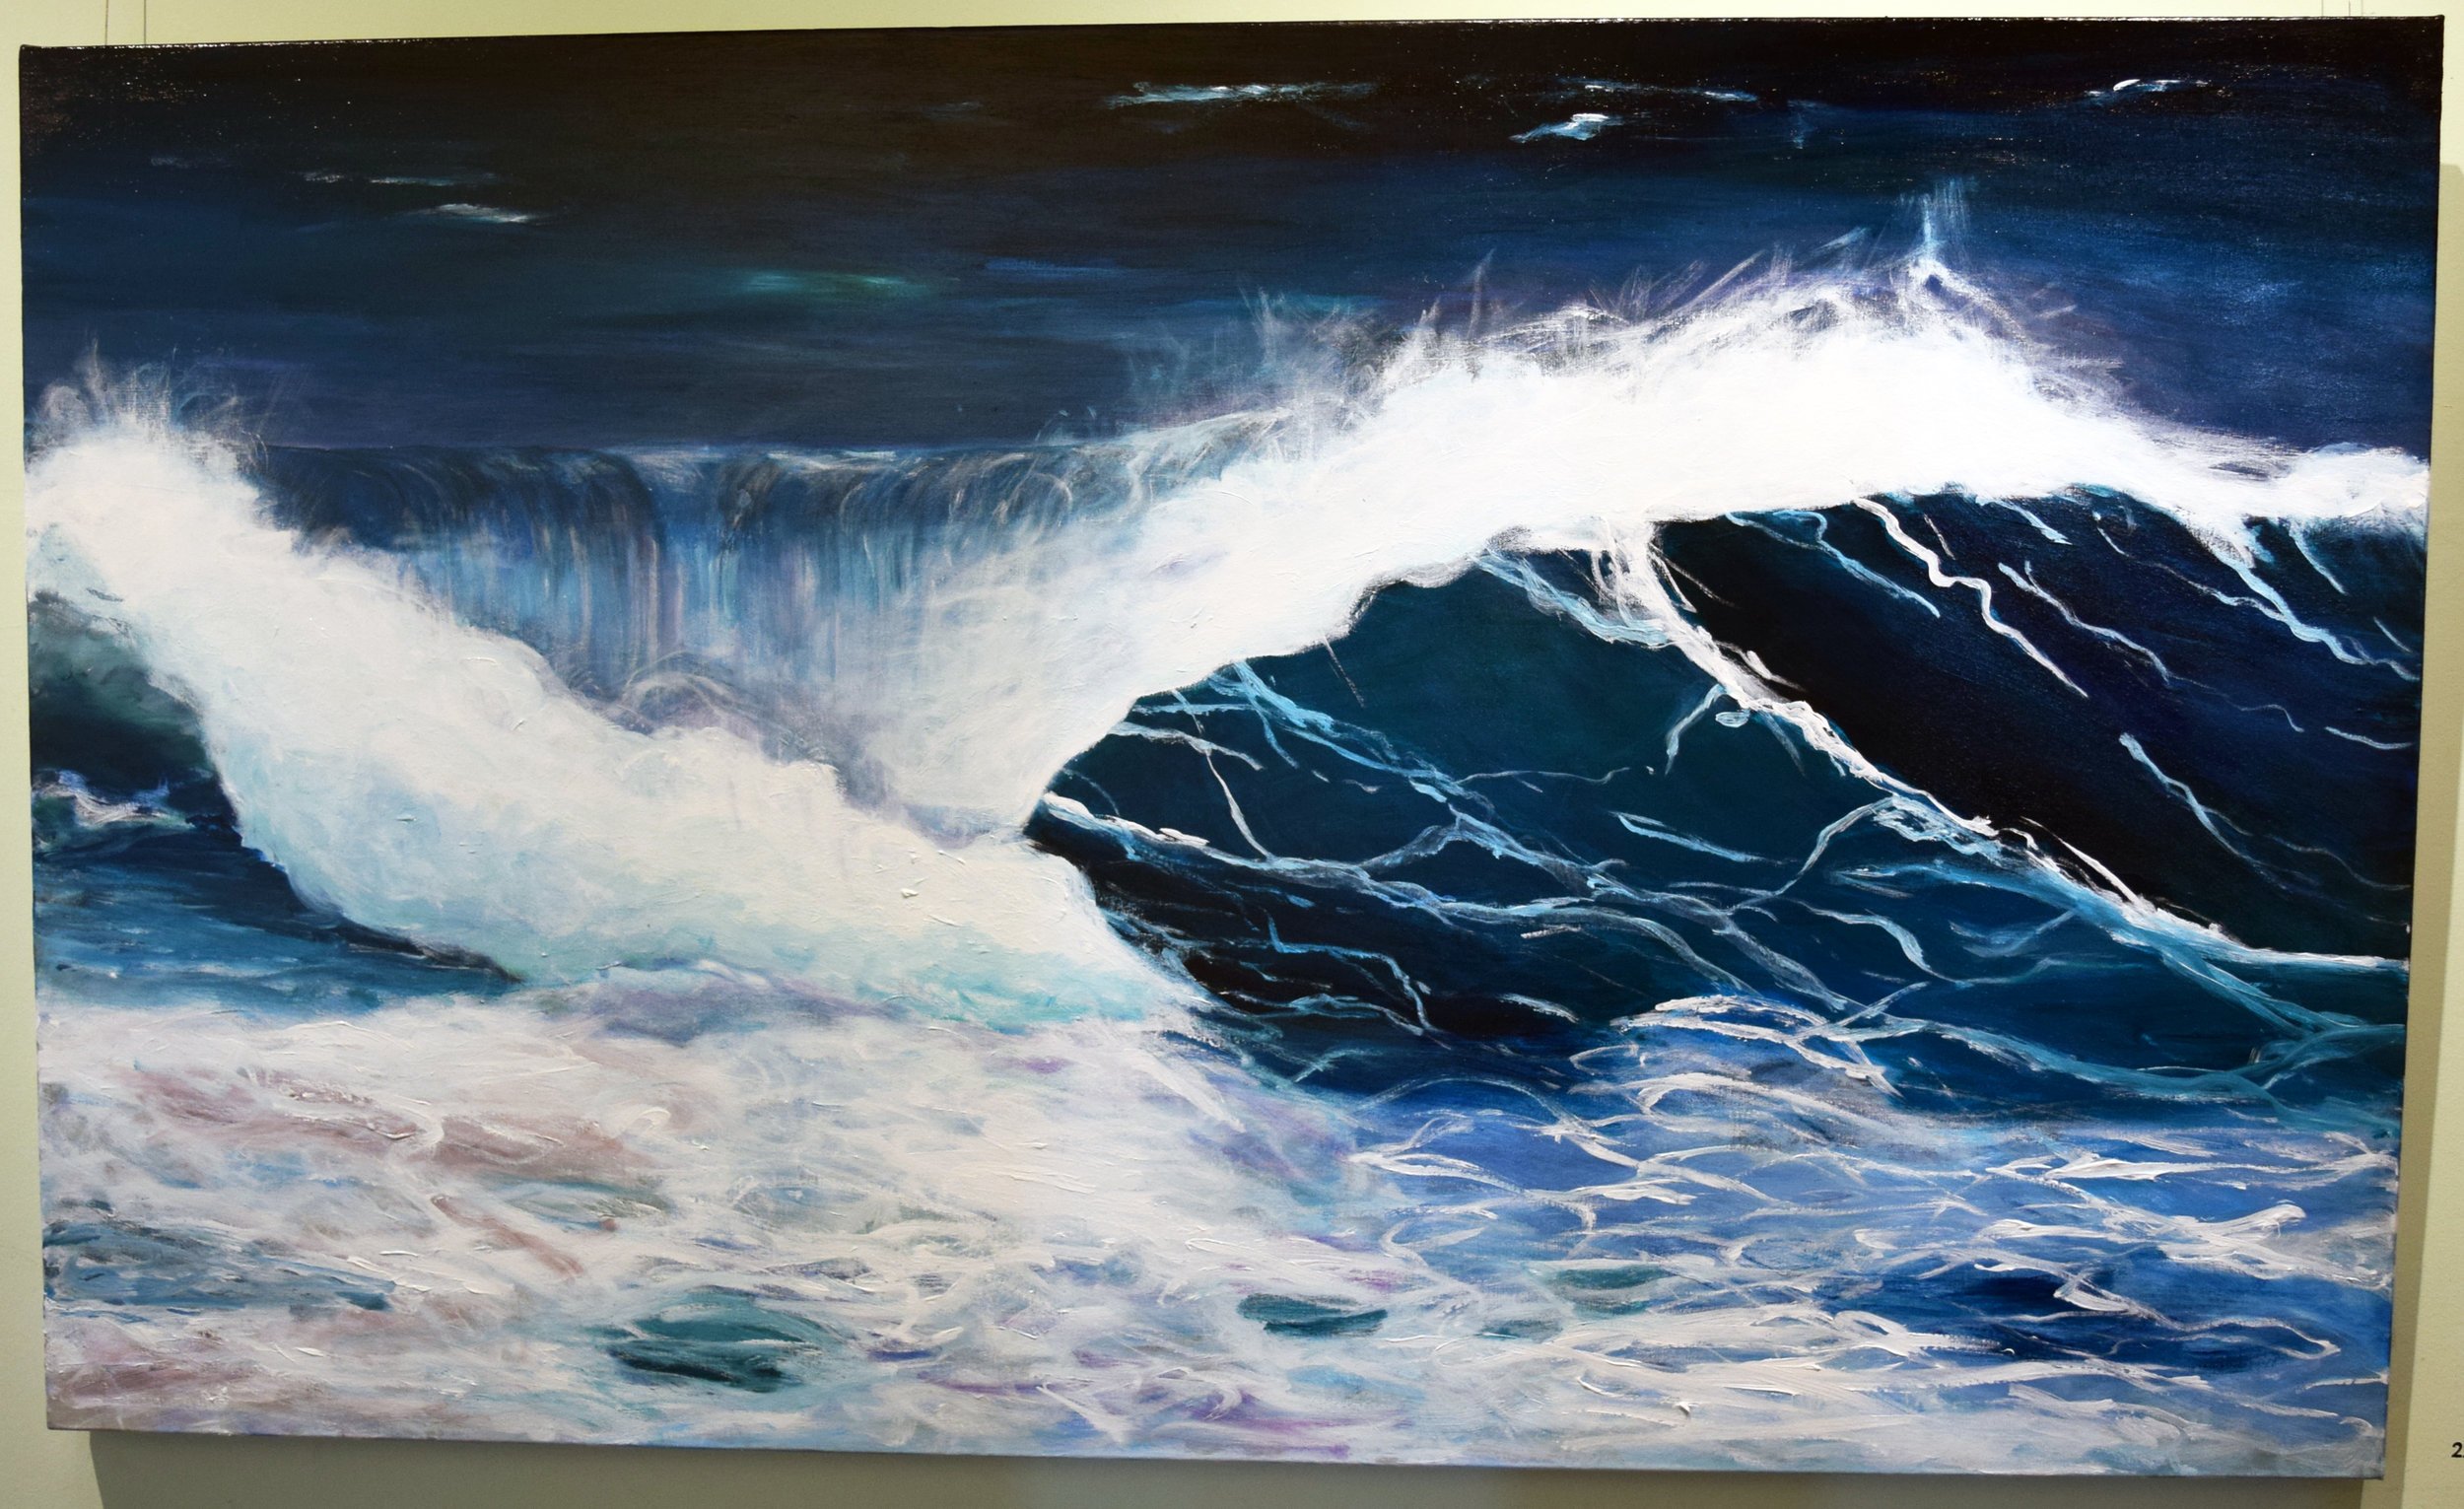 22. Jenny McGrath, Tumultuous, 2018, acrylic on canvas, 90 x 150 cm, $1,480